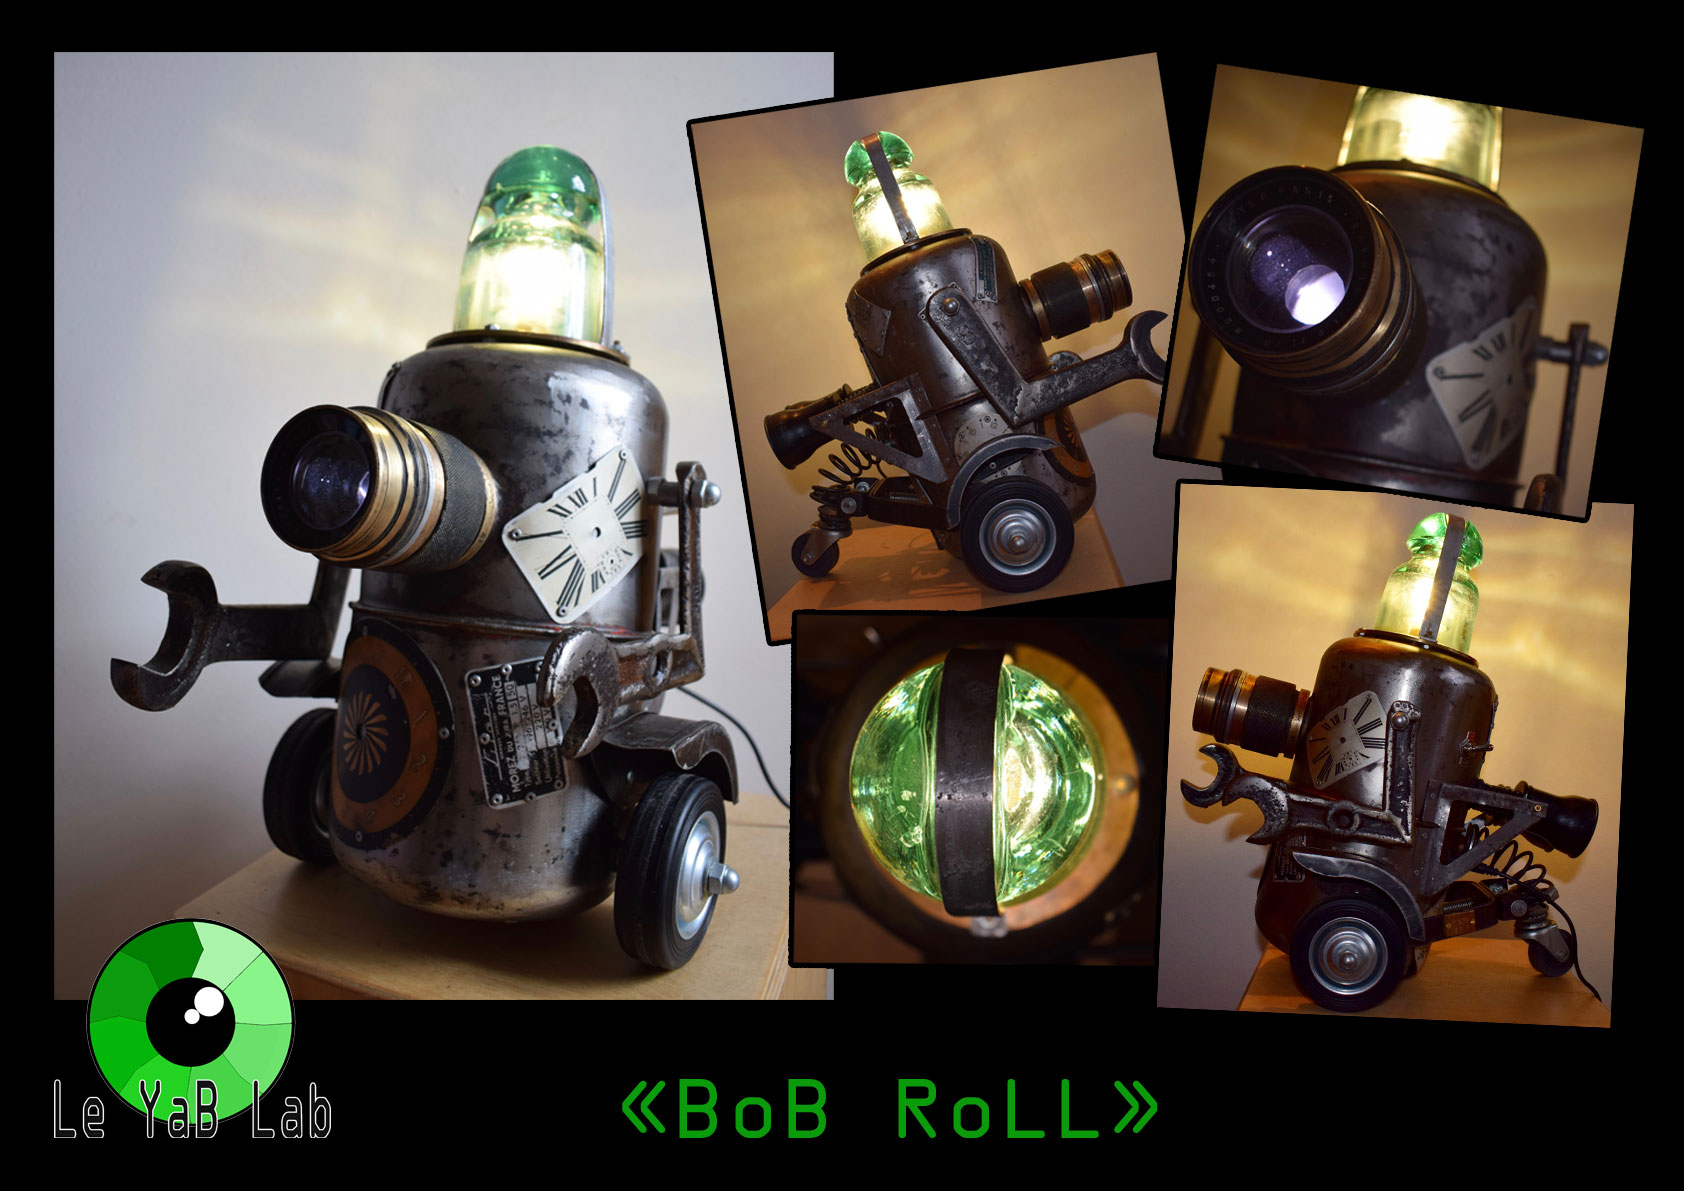 BoB-RoLL